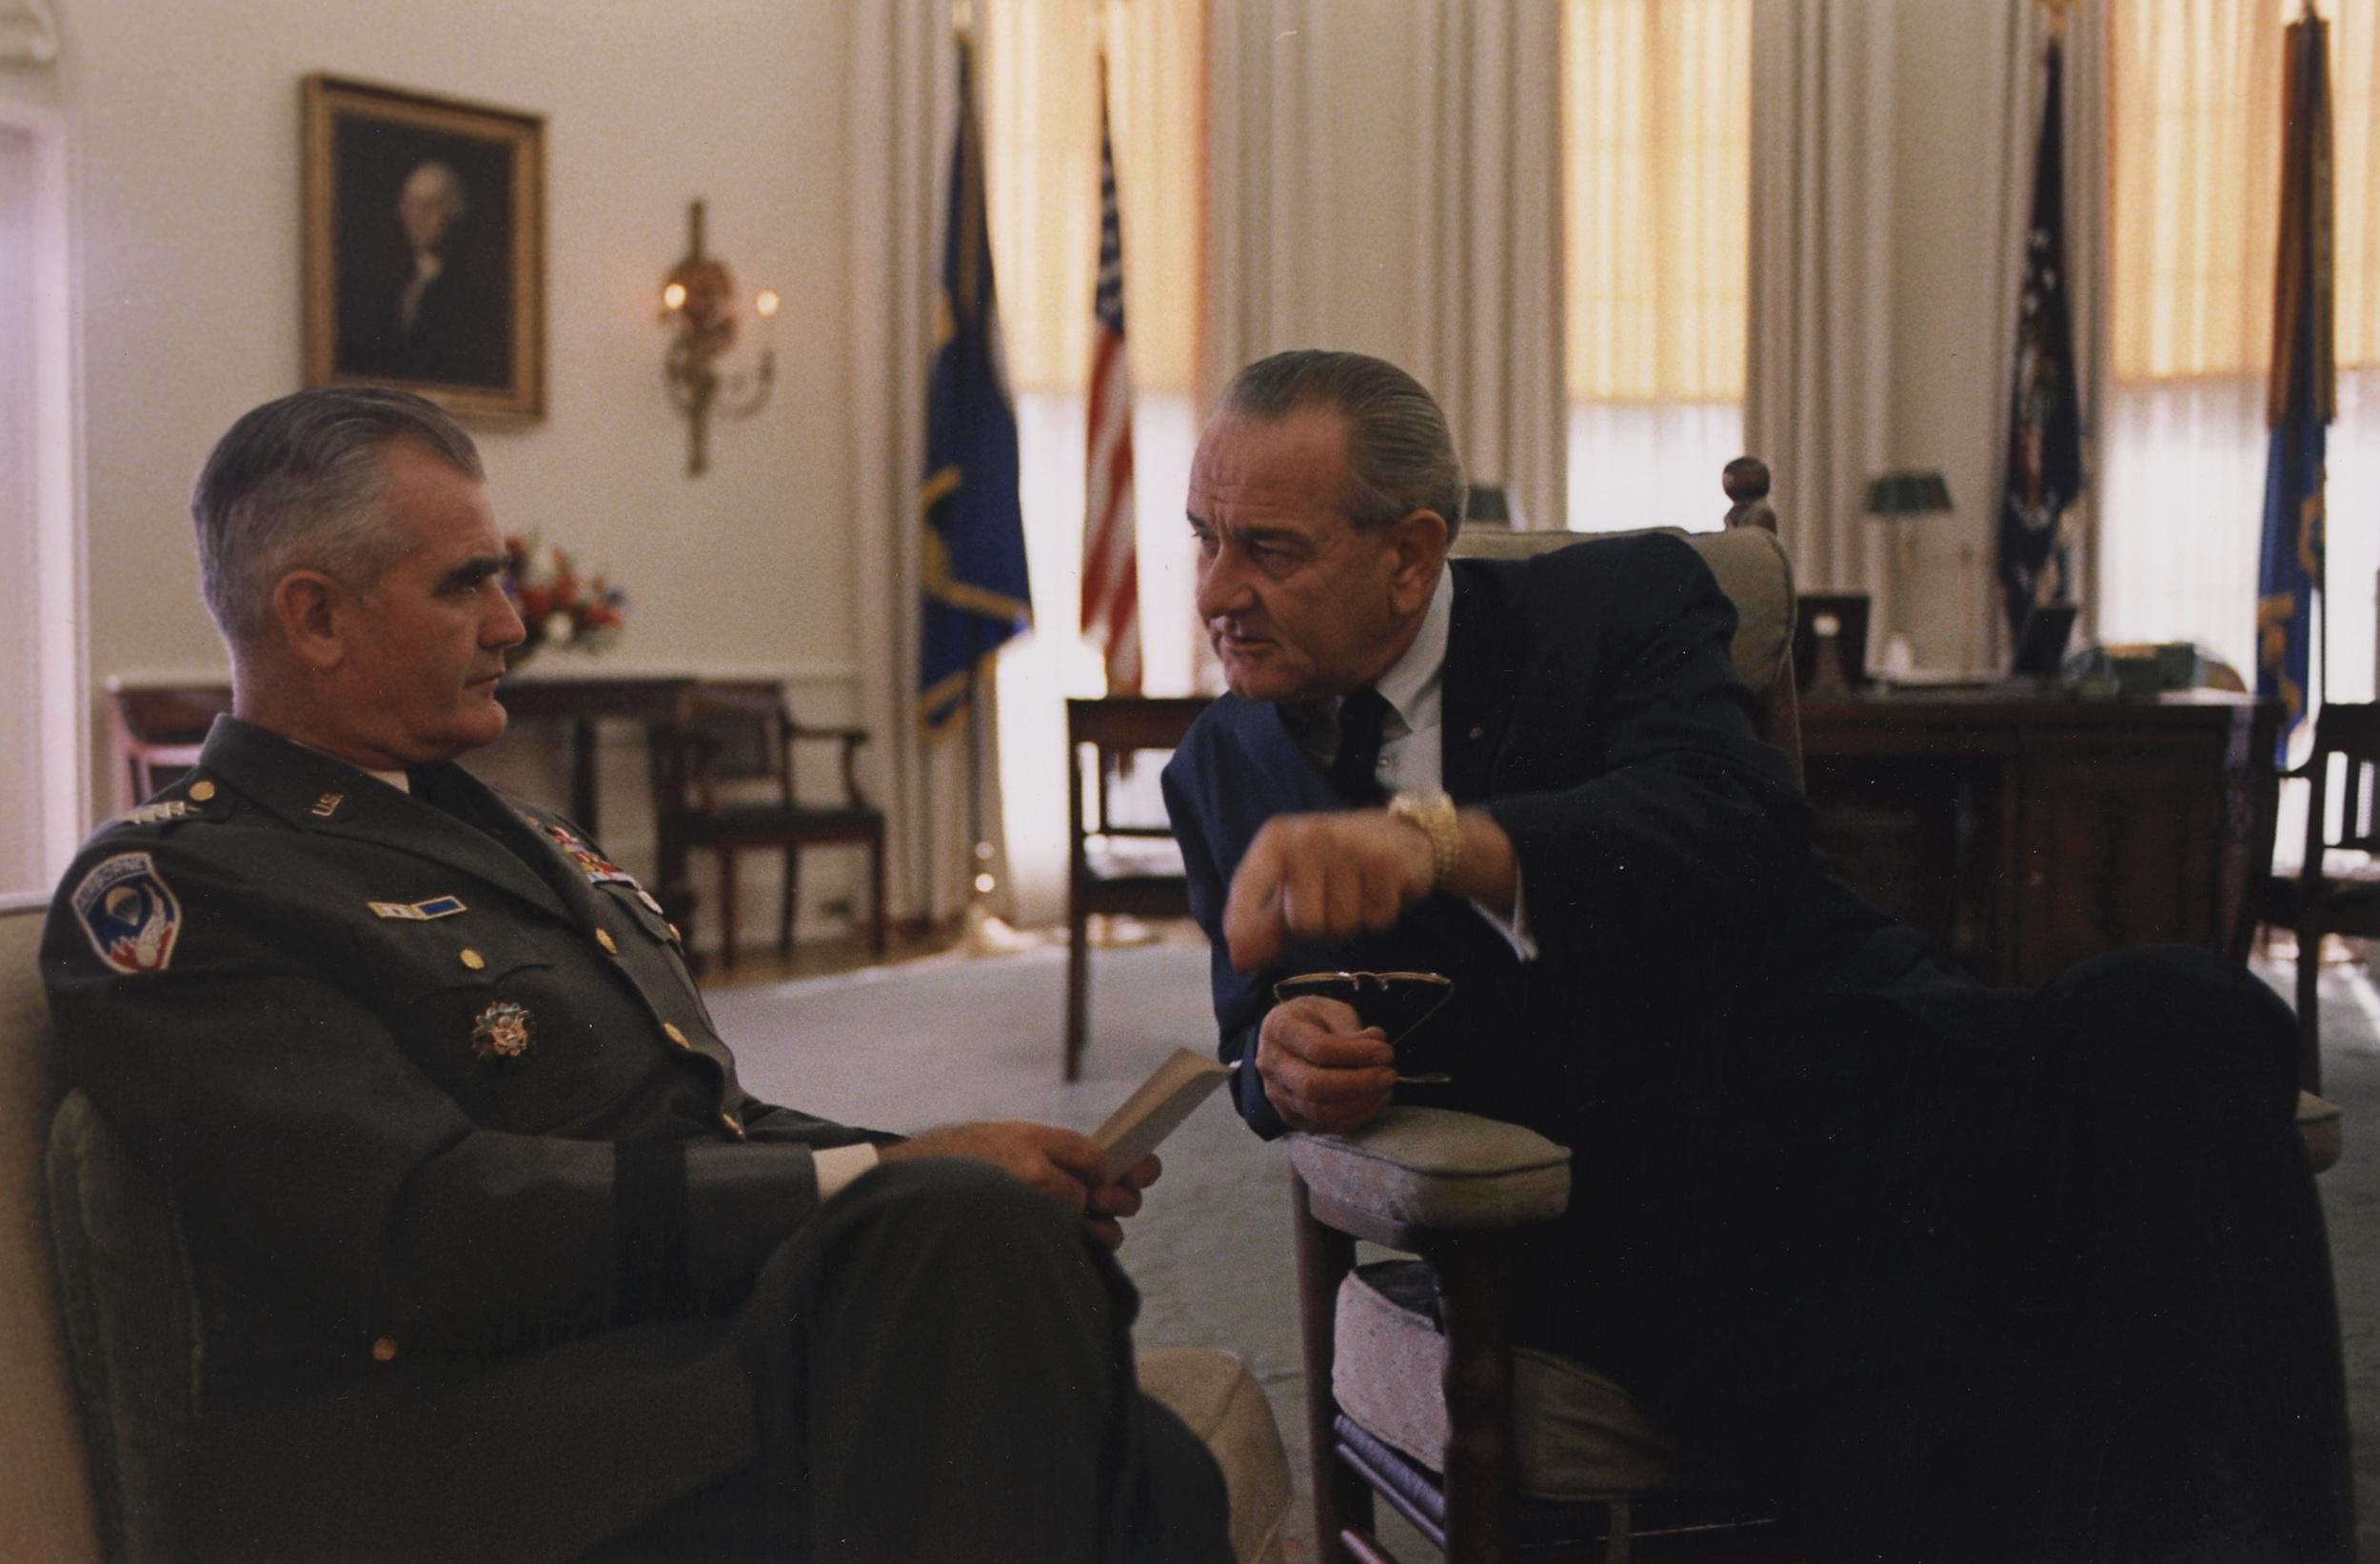 General Westmoreland with Lyndon B. Johnson in the White House, November 1967. (Yoichi Okamoto, Wikimedia Commons)